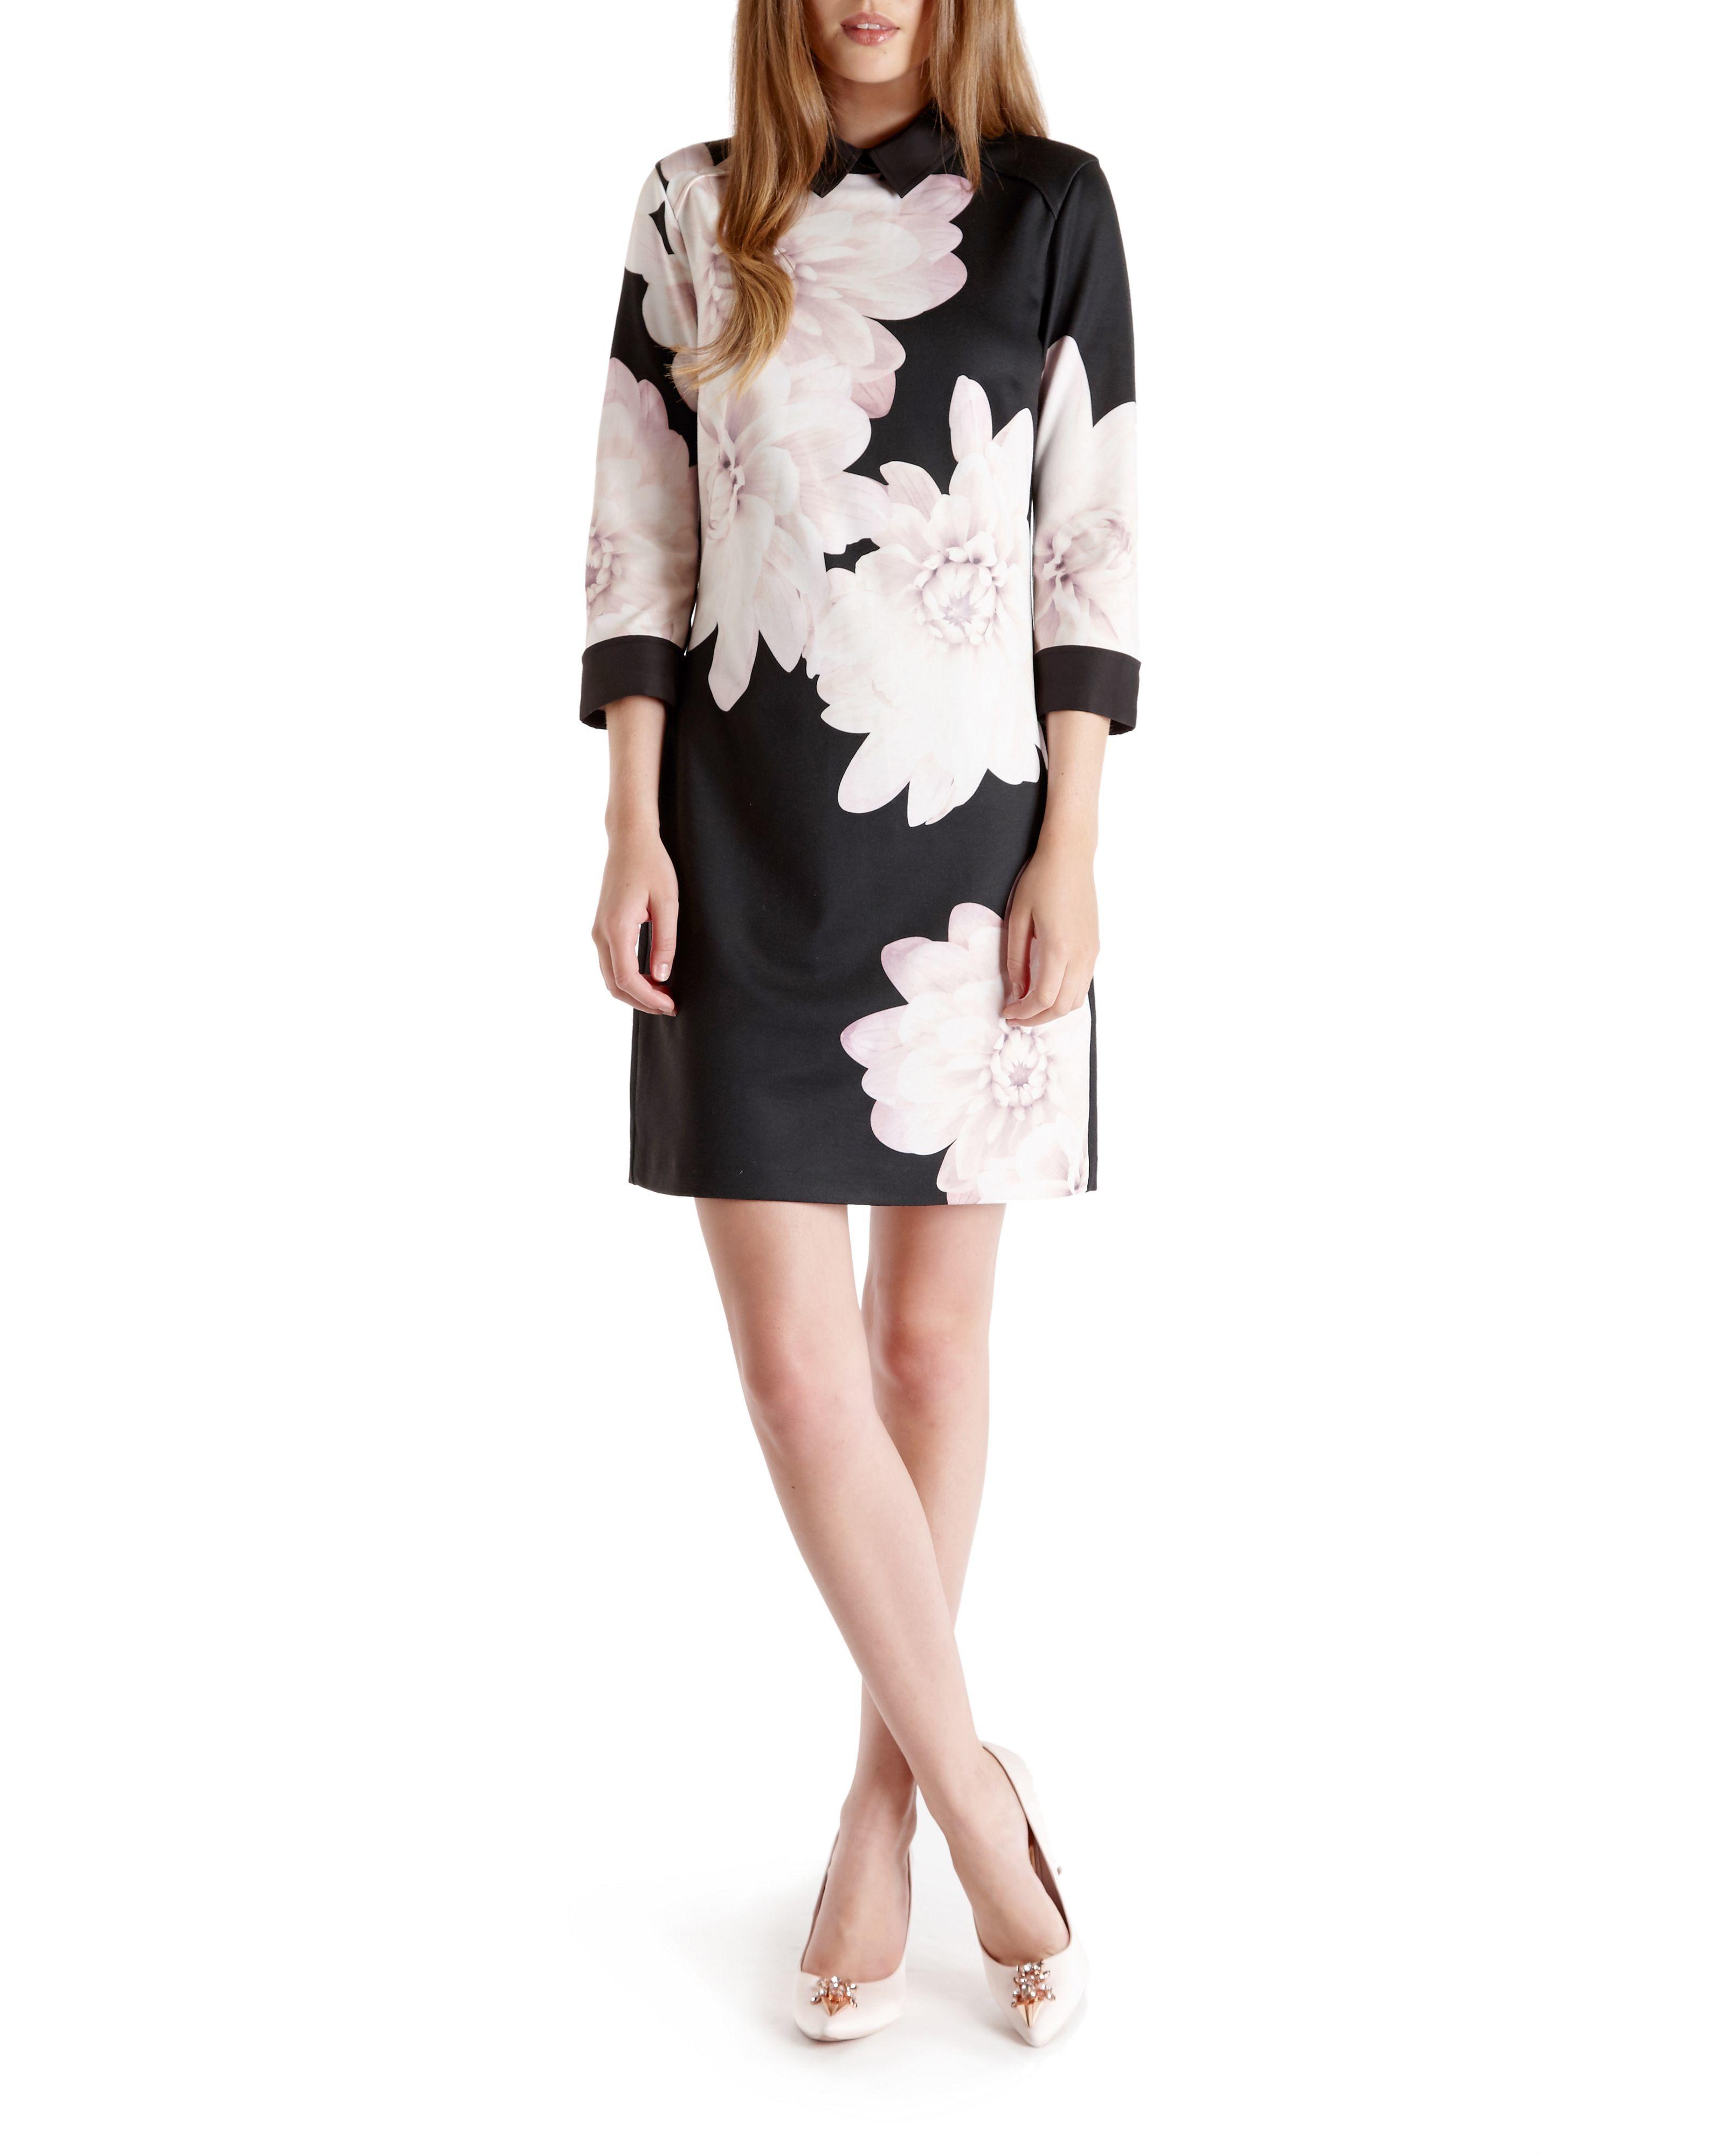 Best Store To Get Online For Sale Buy Authentic Online Printed Shift Dress Ted Baker skbOCxvRfg